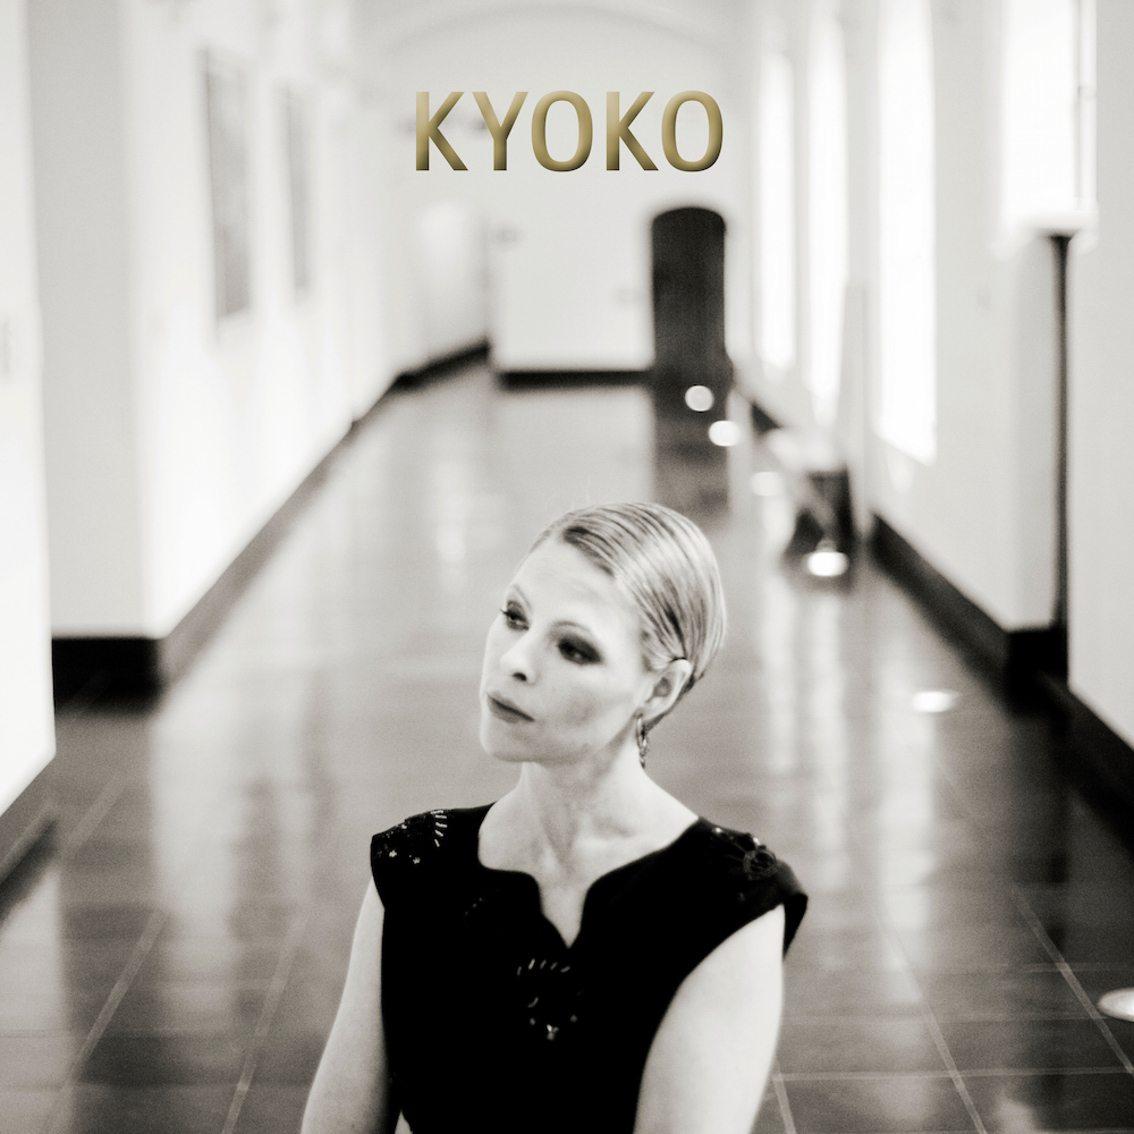 Kyoko Baertsoen (ex-Hooverphonic, Lunascape) debuts with solo album 'Kyoko'